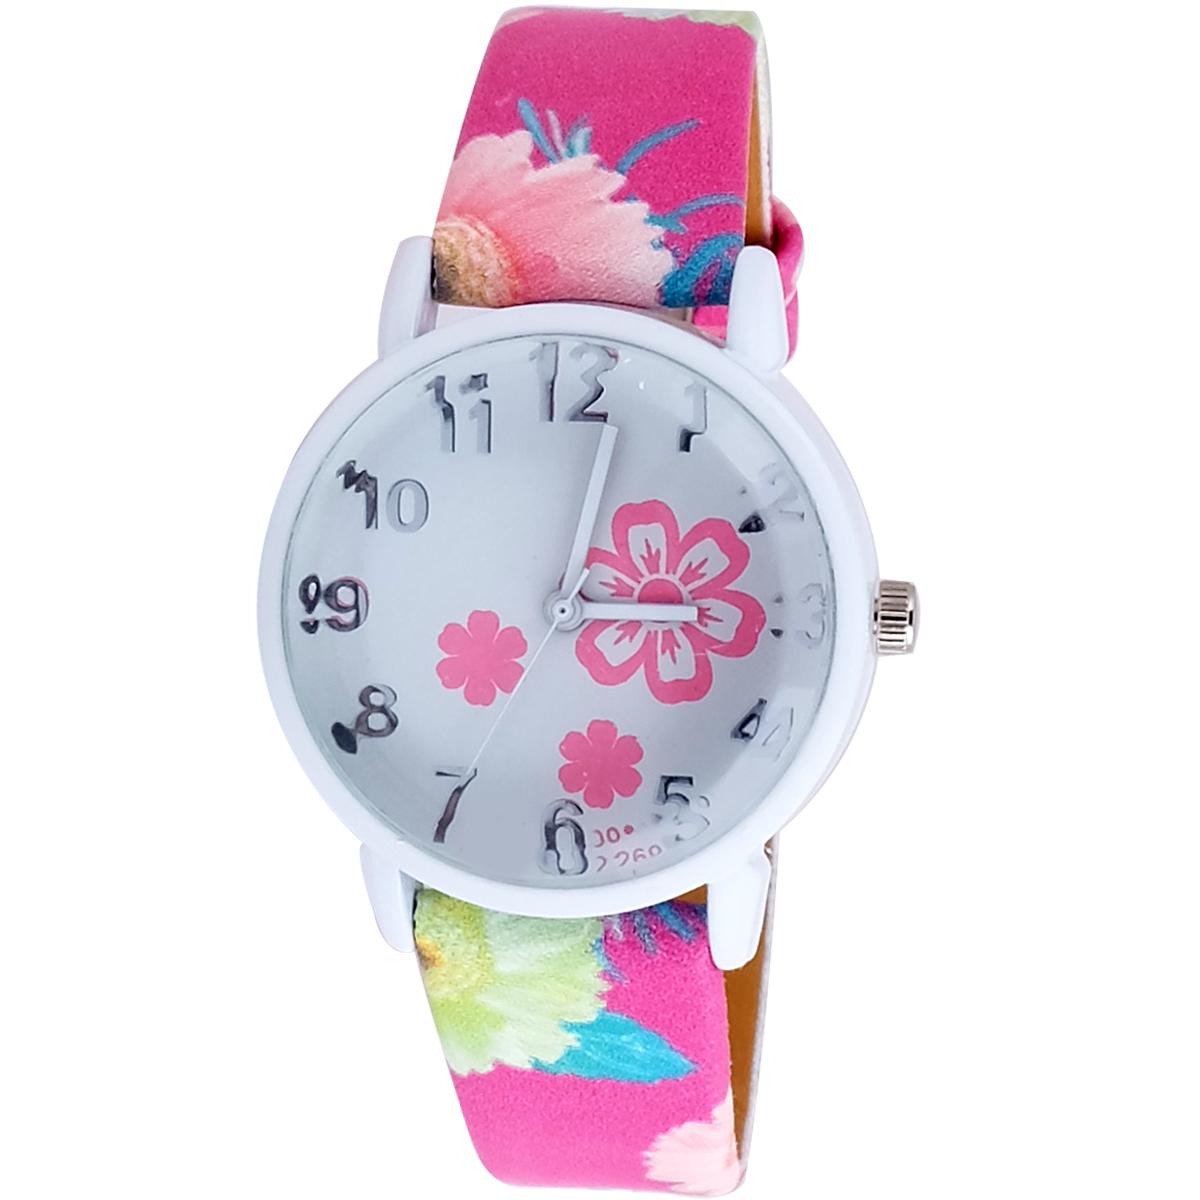 Super Drool Pink Spring Flower Strap Analog Wrist Watch